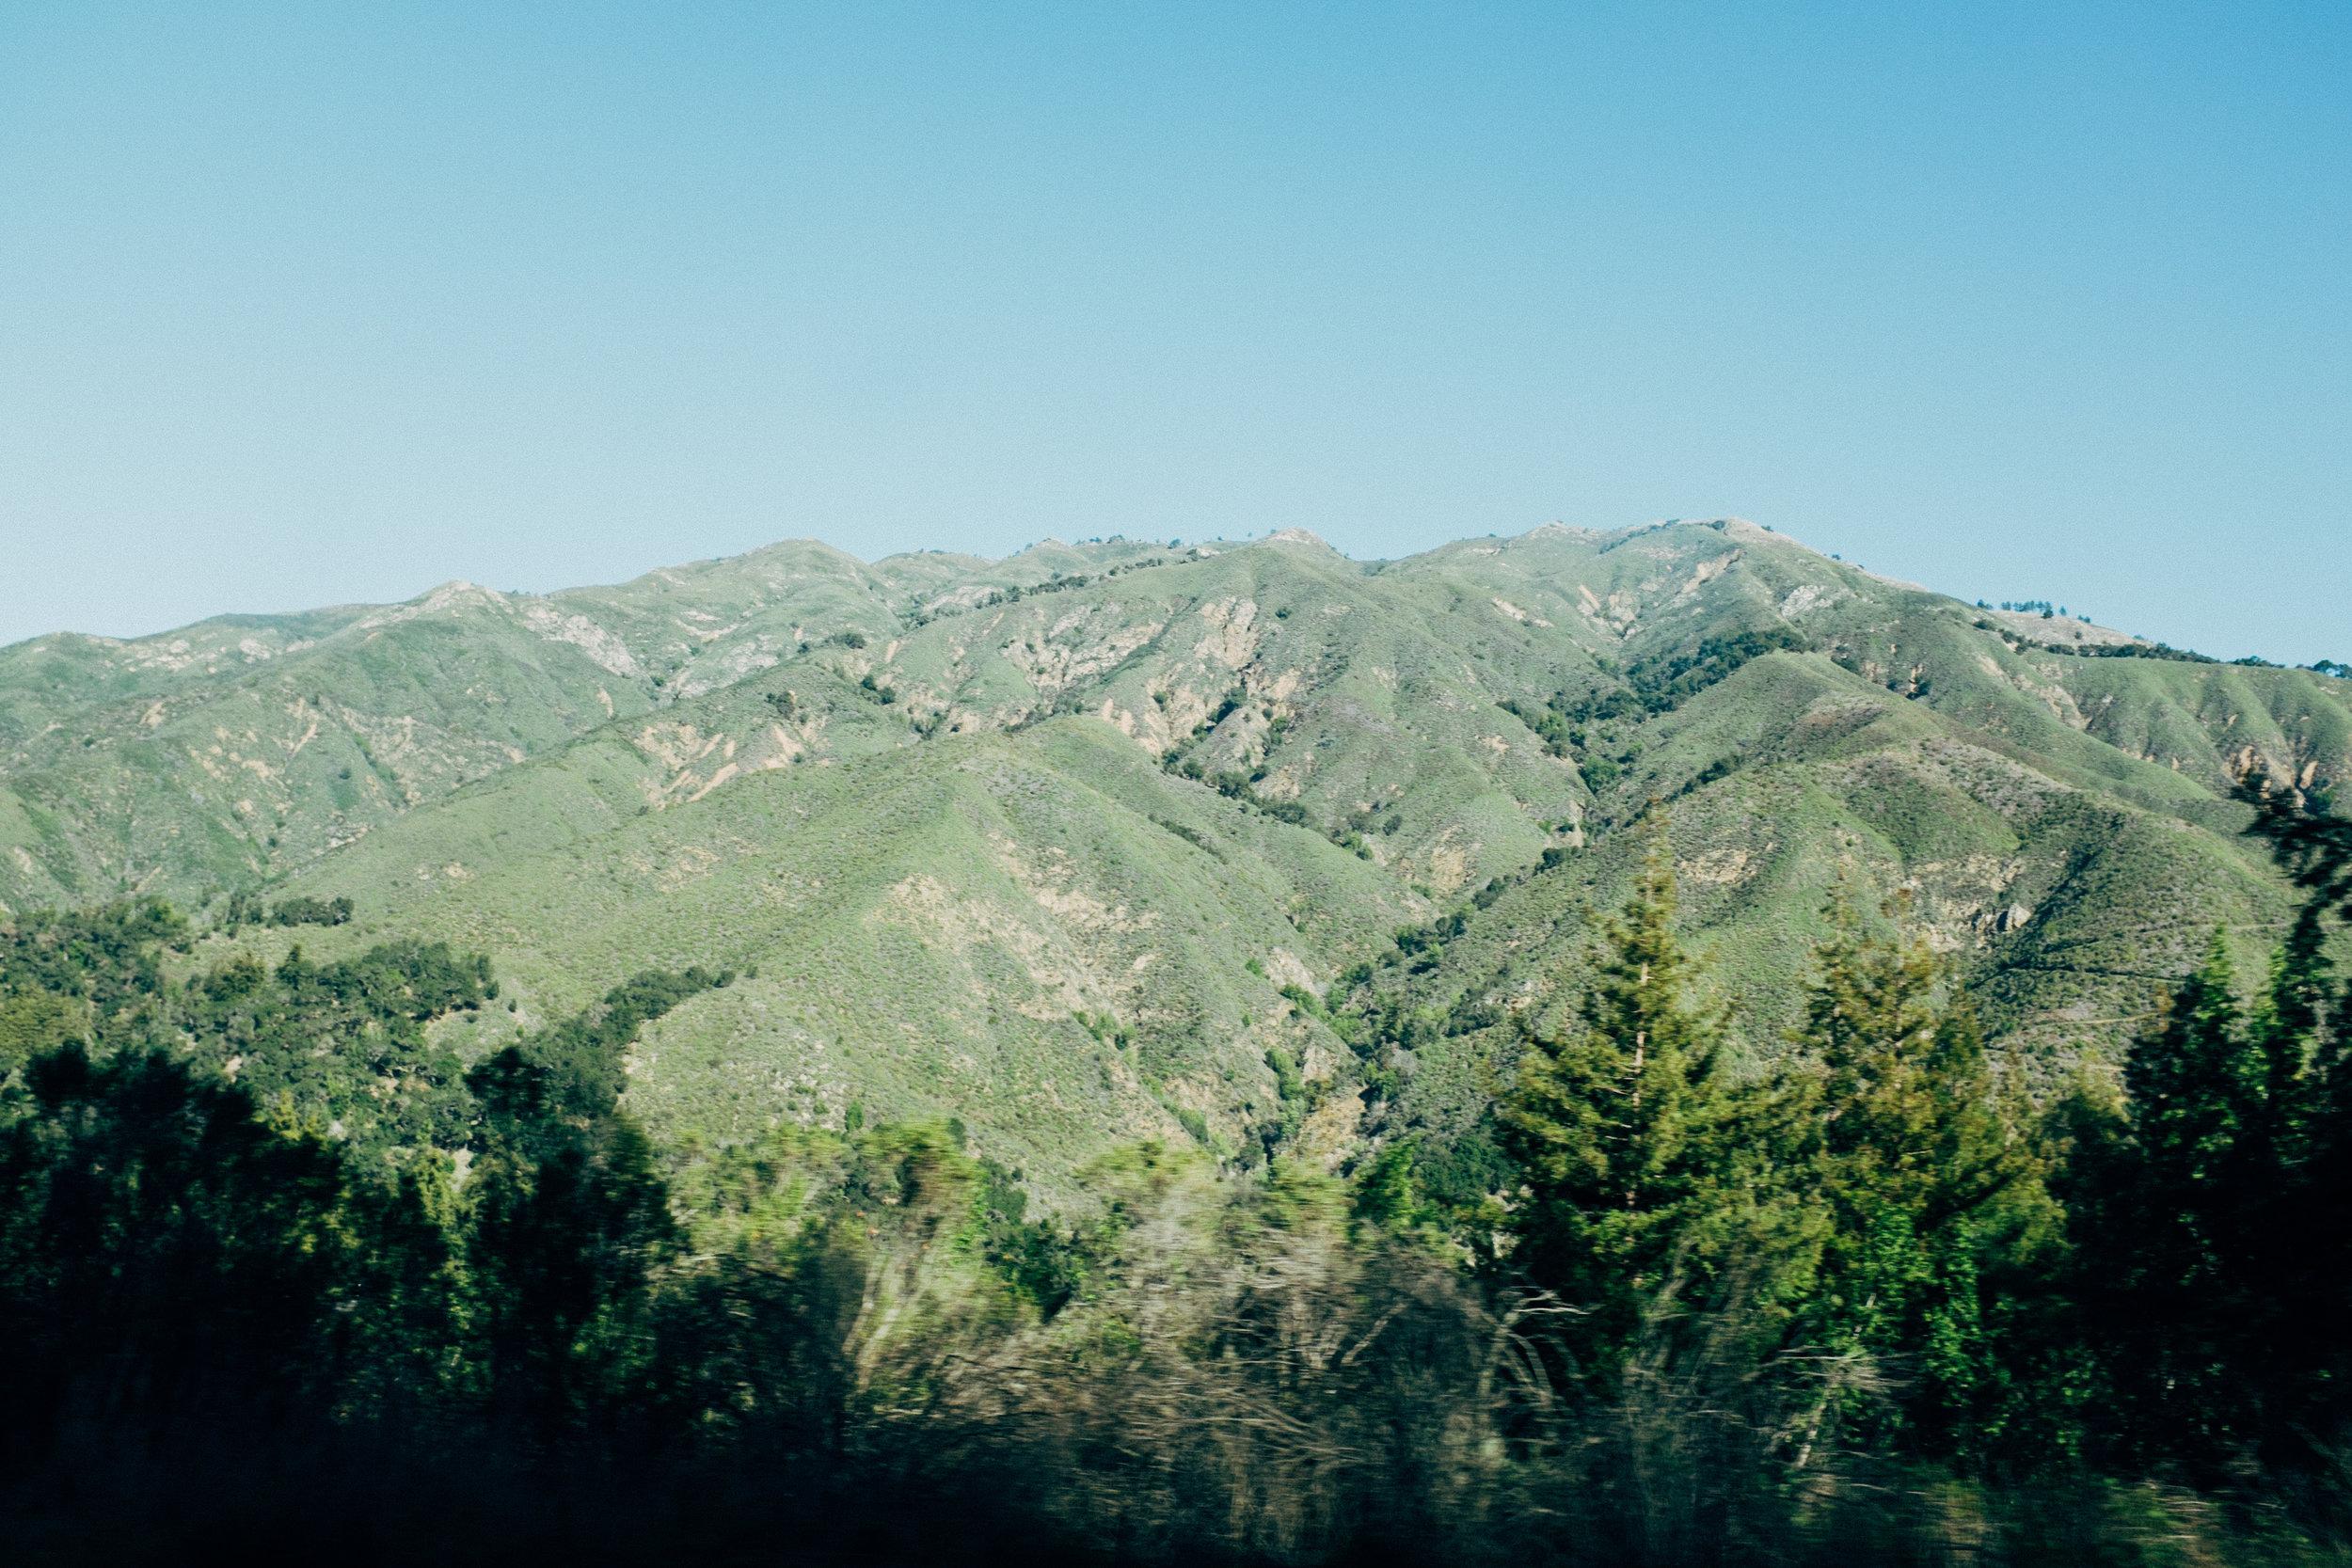 Big Sur Mountains California Toronto Travel Photographers - Suech and Beck